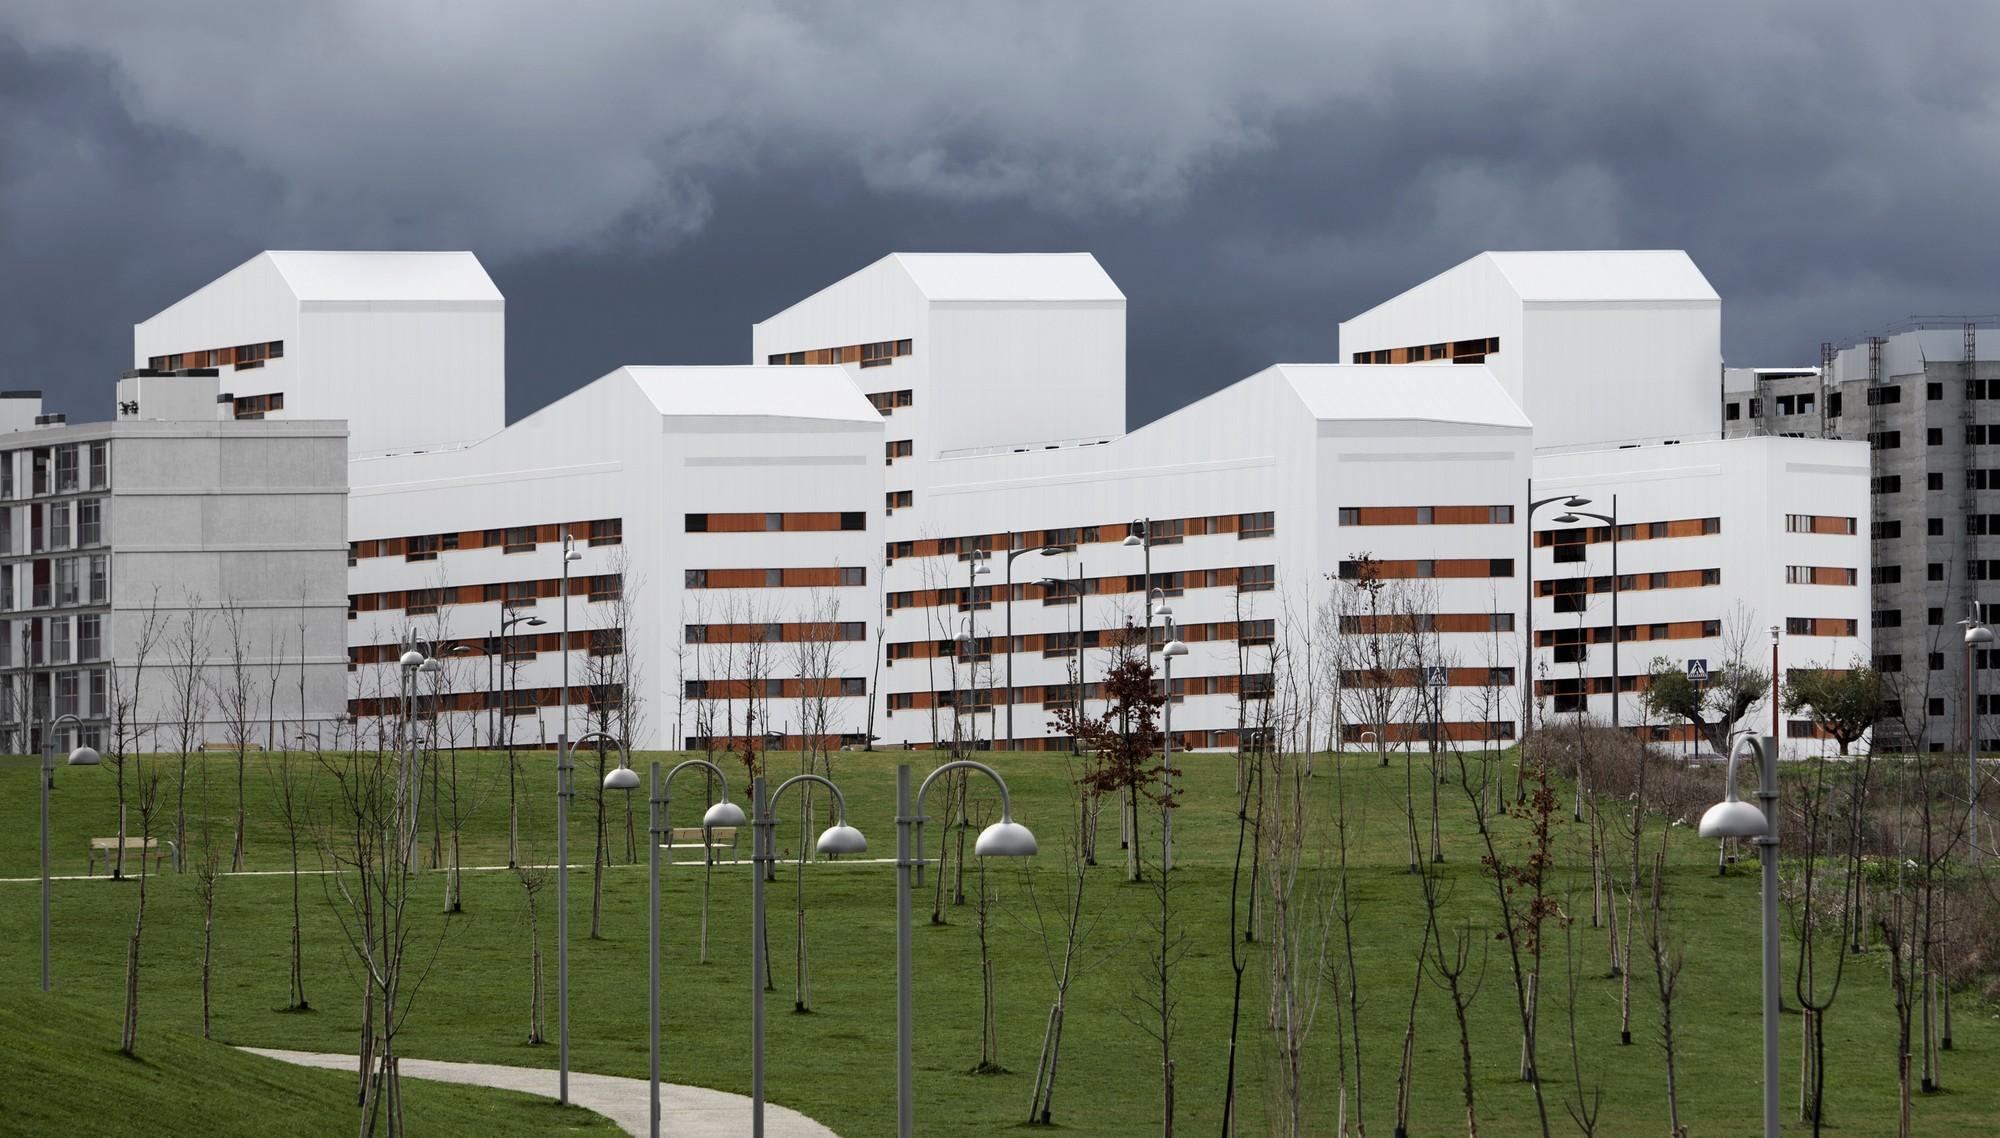 Galeria de novo conjunto habitacional de interesse social - Arquitectos vitoria ...